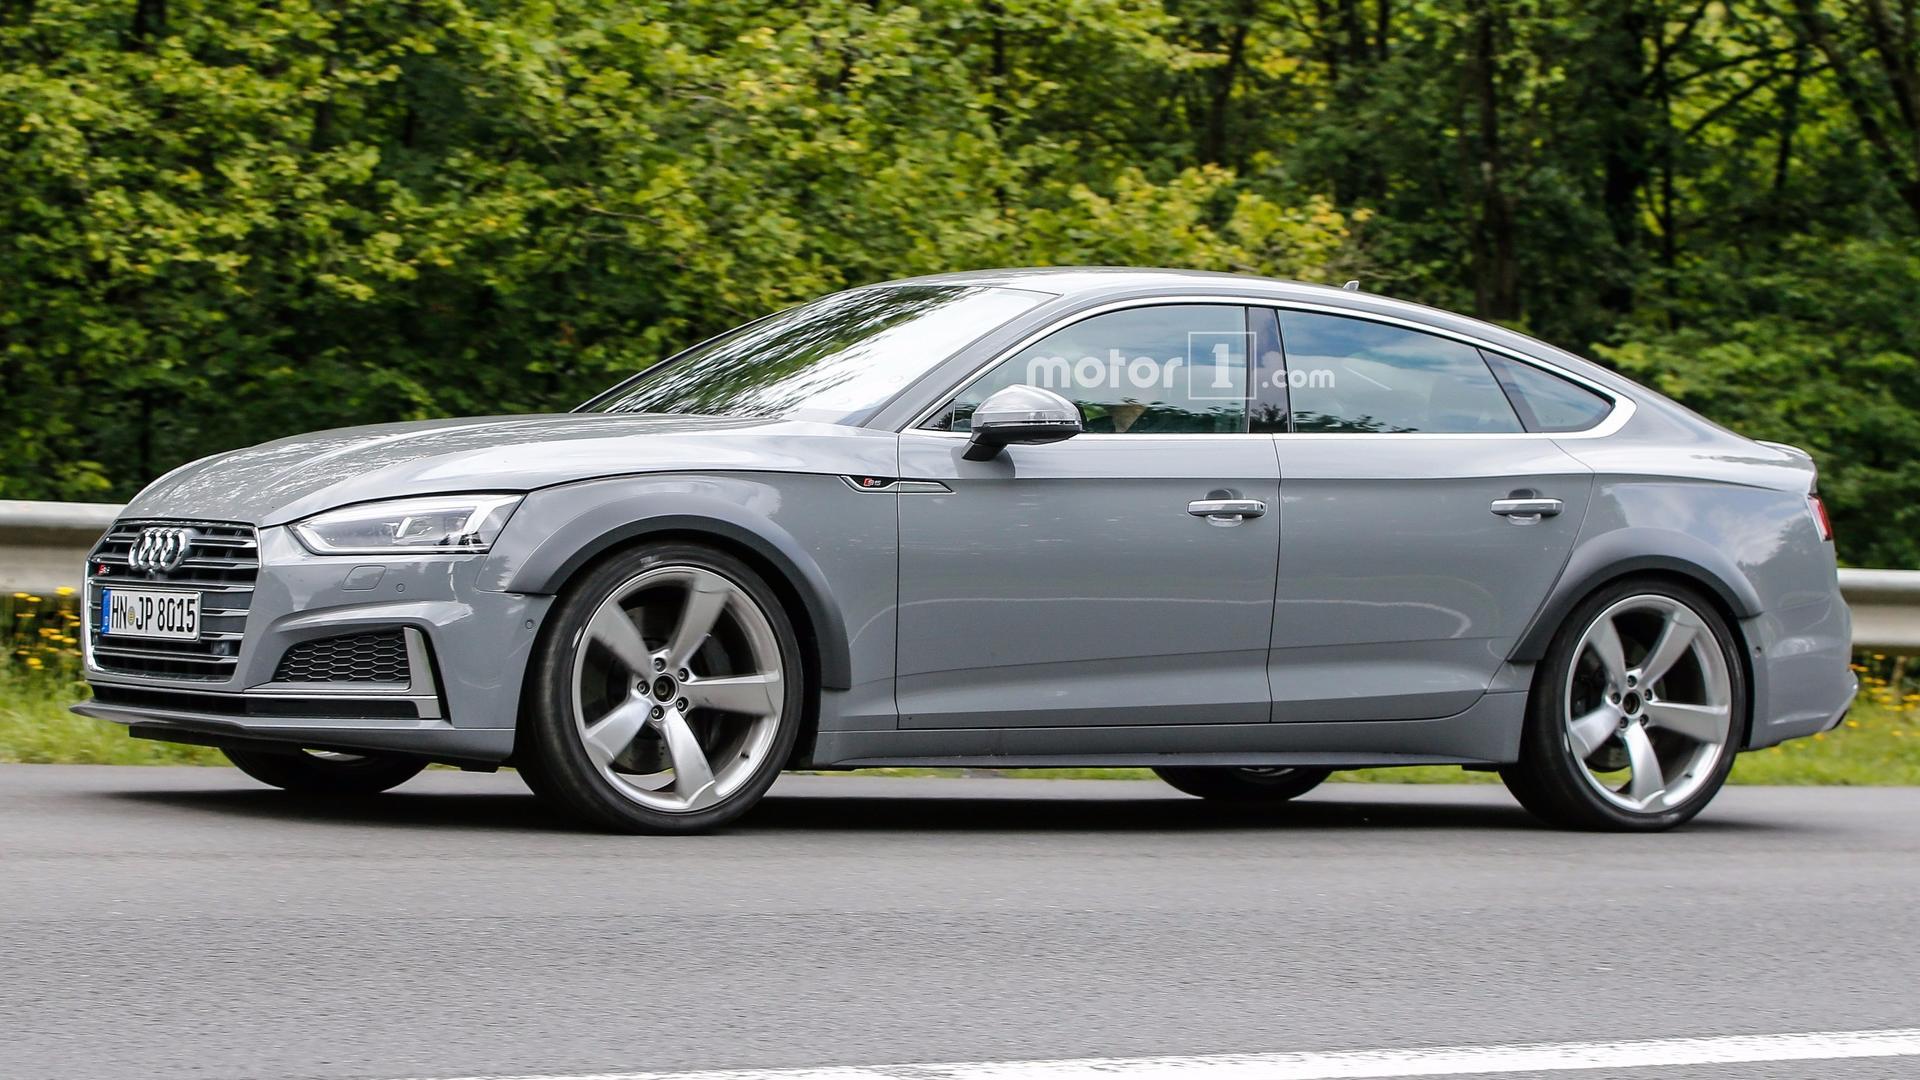 Kekurangan Audi S5 2019 Spesifikasi